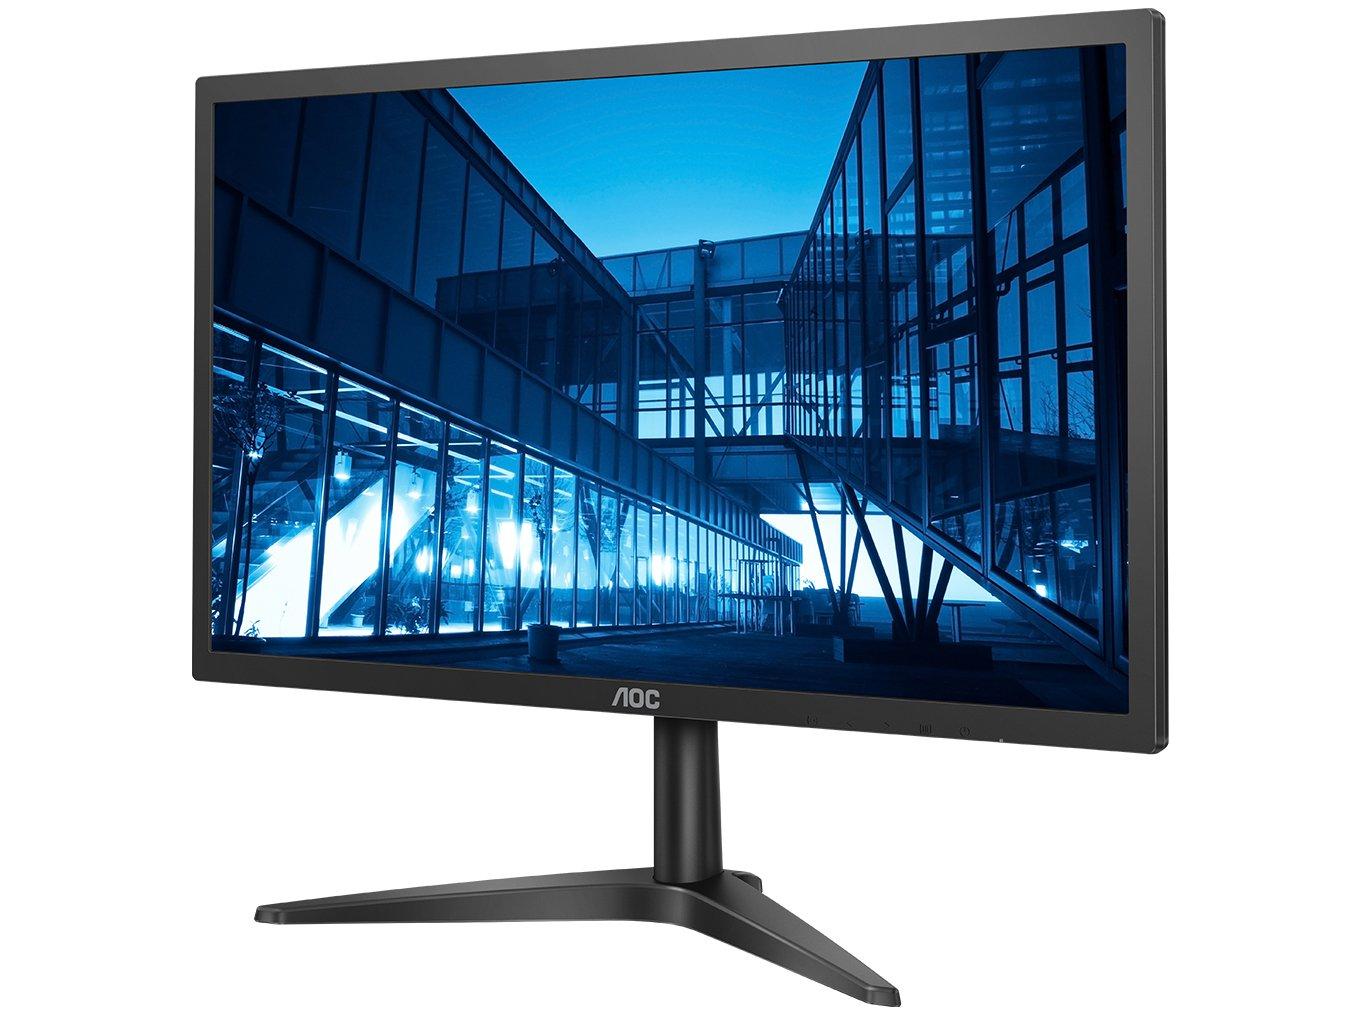 Foto 2 - Monitor para PC Full HD AOC LED Widescreen 21,5 - B1 22B1H